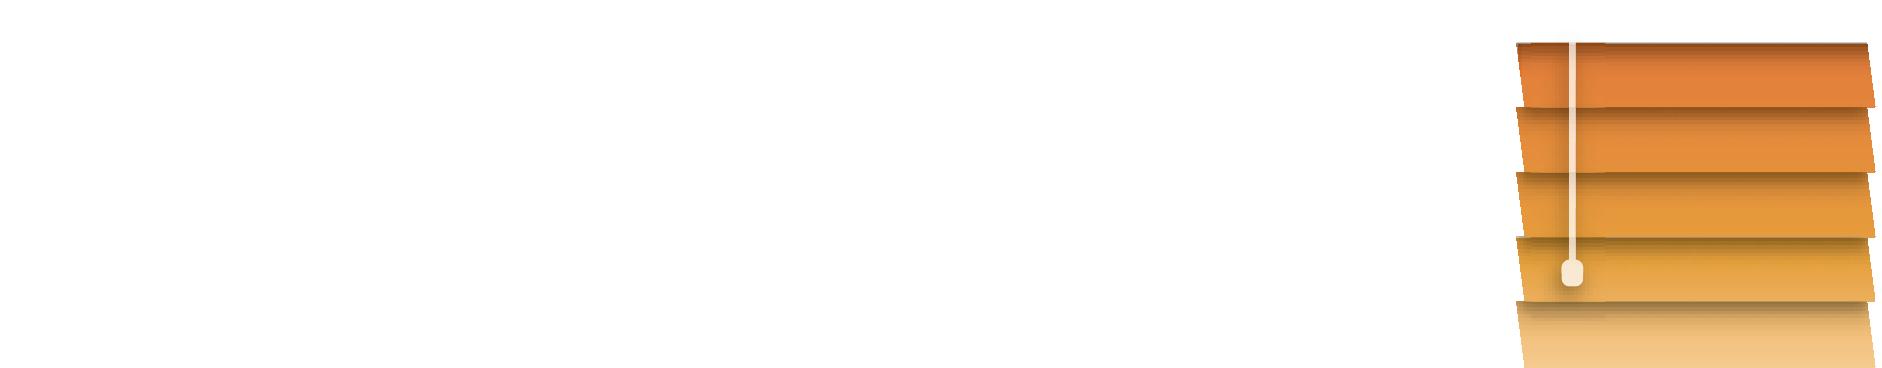 Convergent Technologies